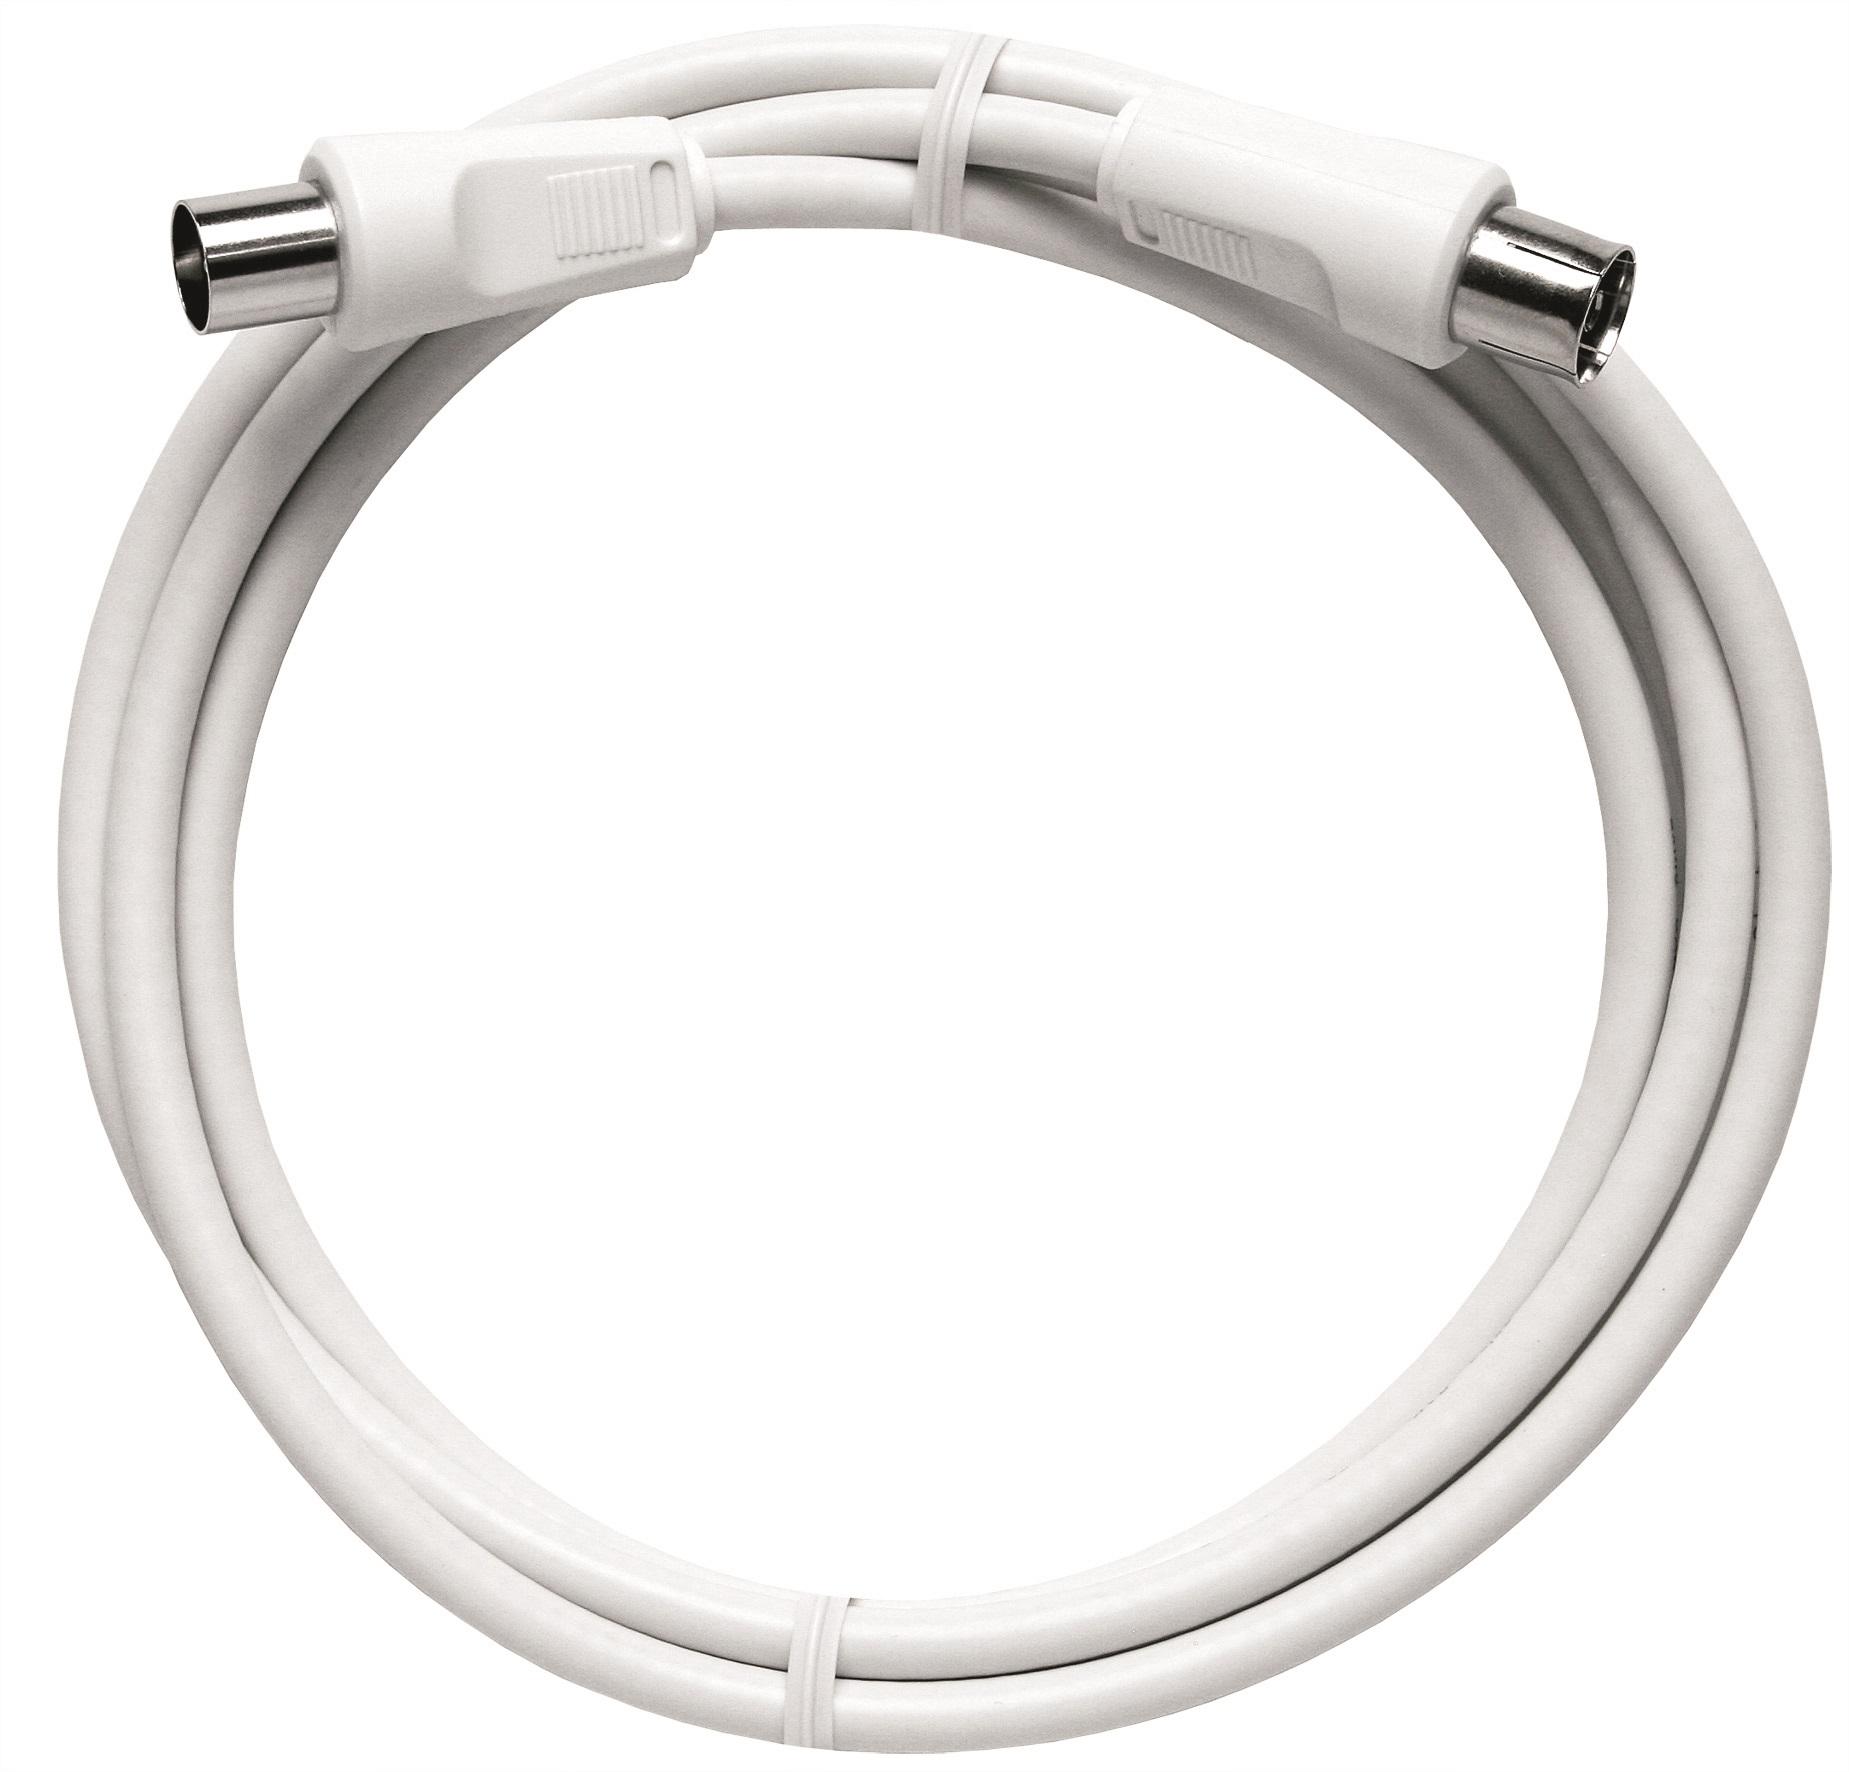 1 Stk BK Koax Patchkabel IEC-M/IEC-F,ger.,Cl.A,ws,10,0m,BAK 999-90 HSBKPIGXK0